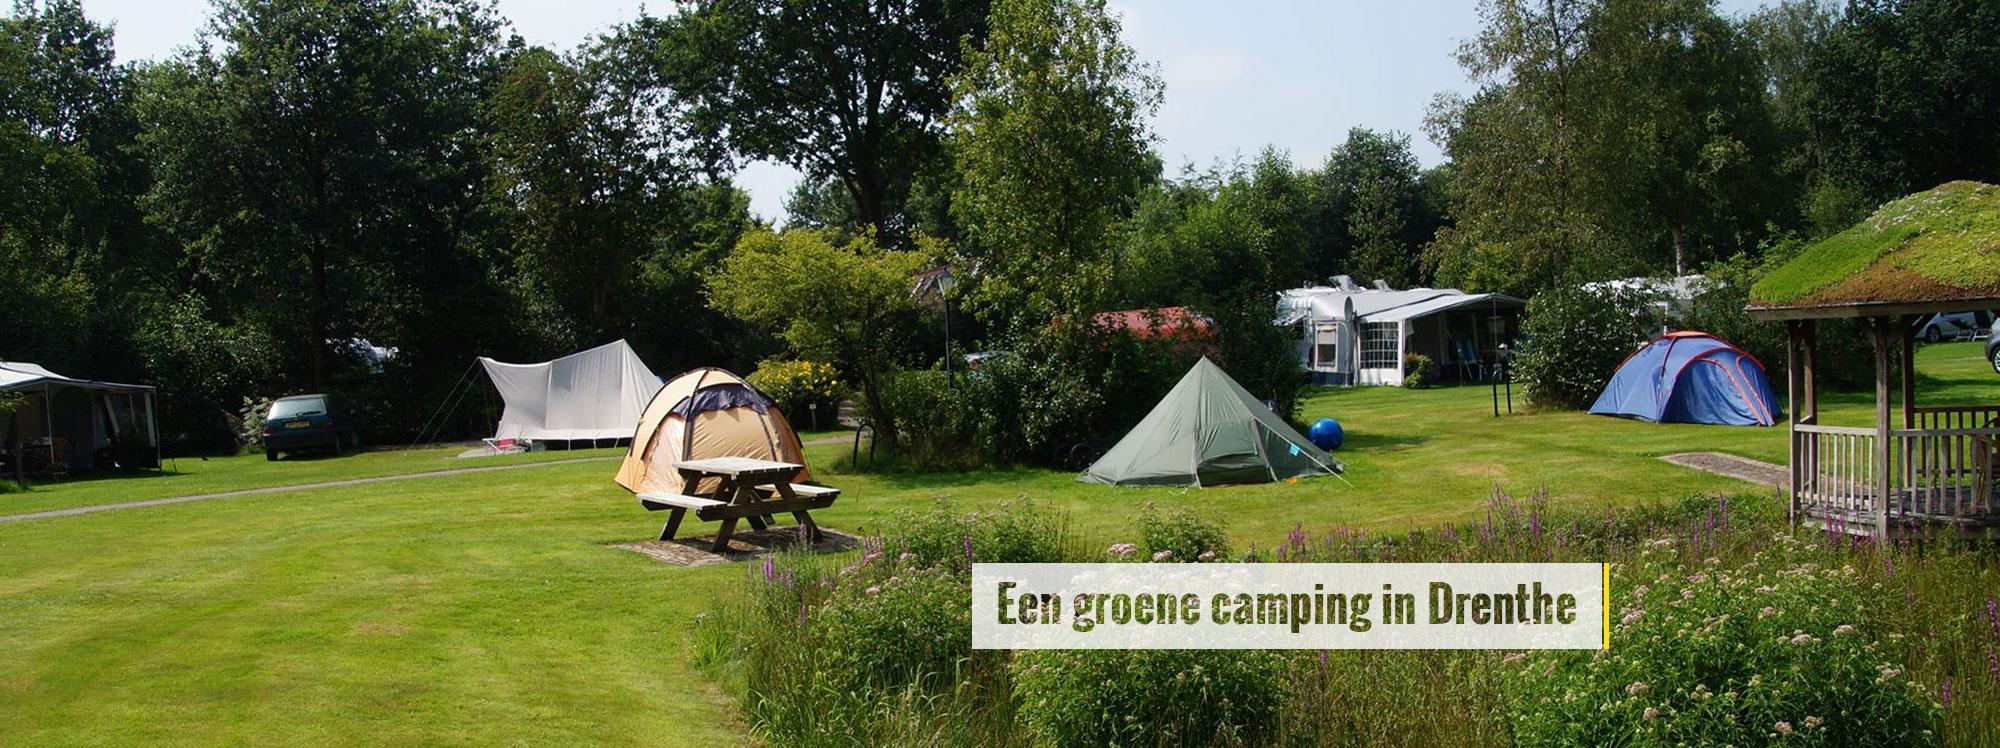 slide_groene_camping